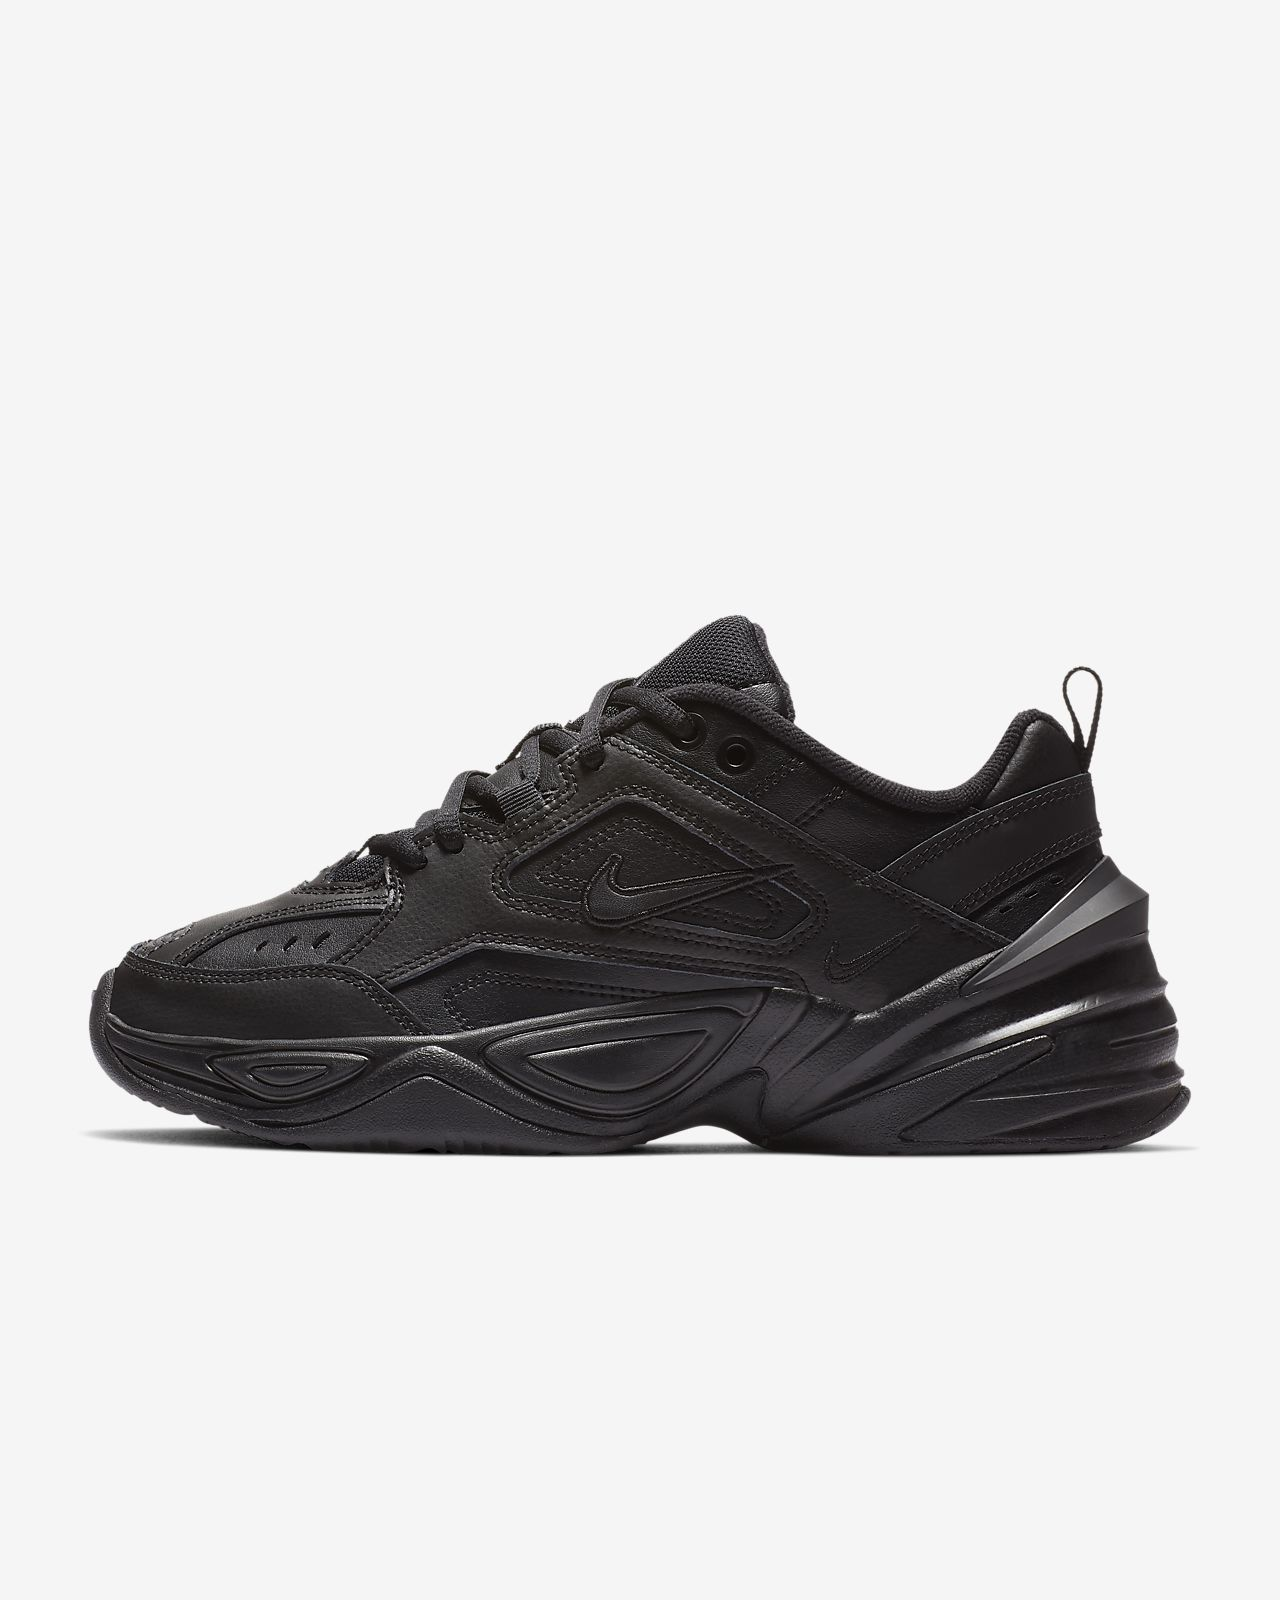 Ca Nike Pour M2k Tekno Chaussure Femme qSwvXvd